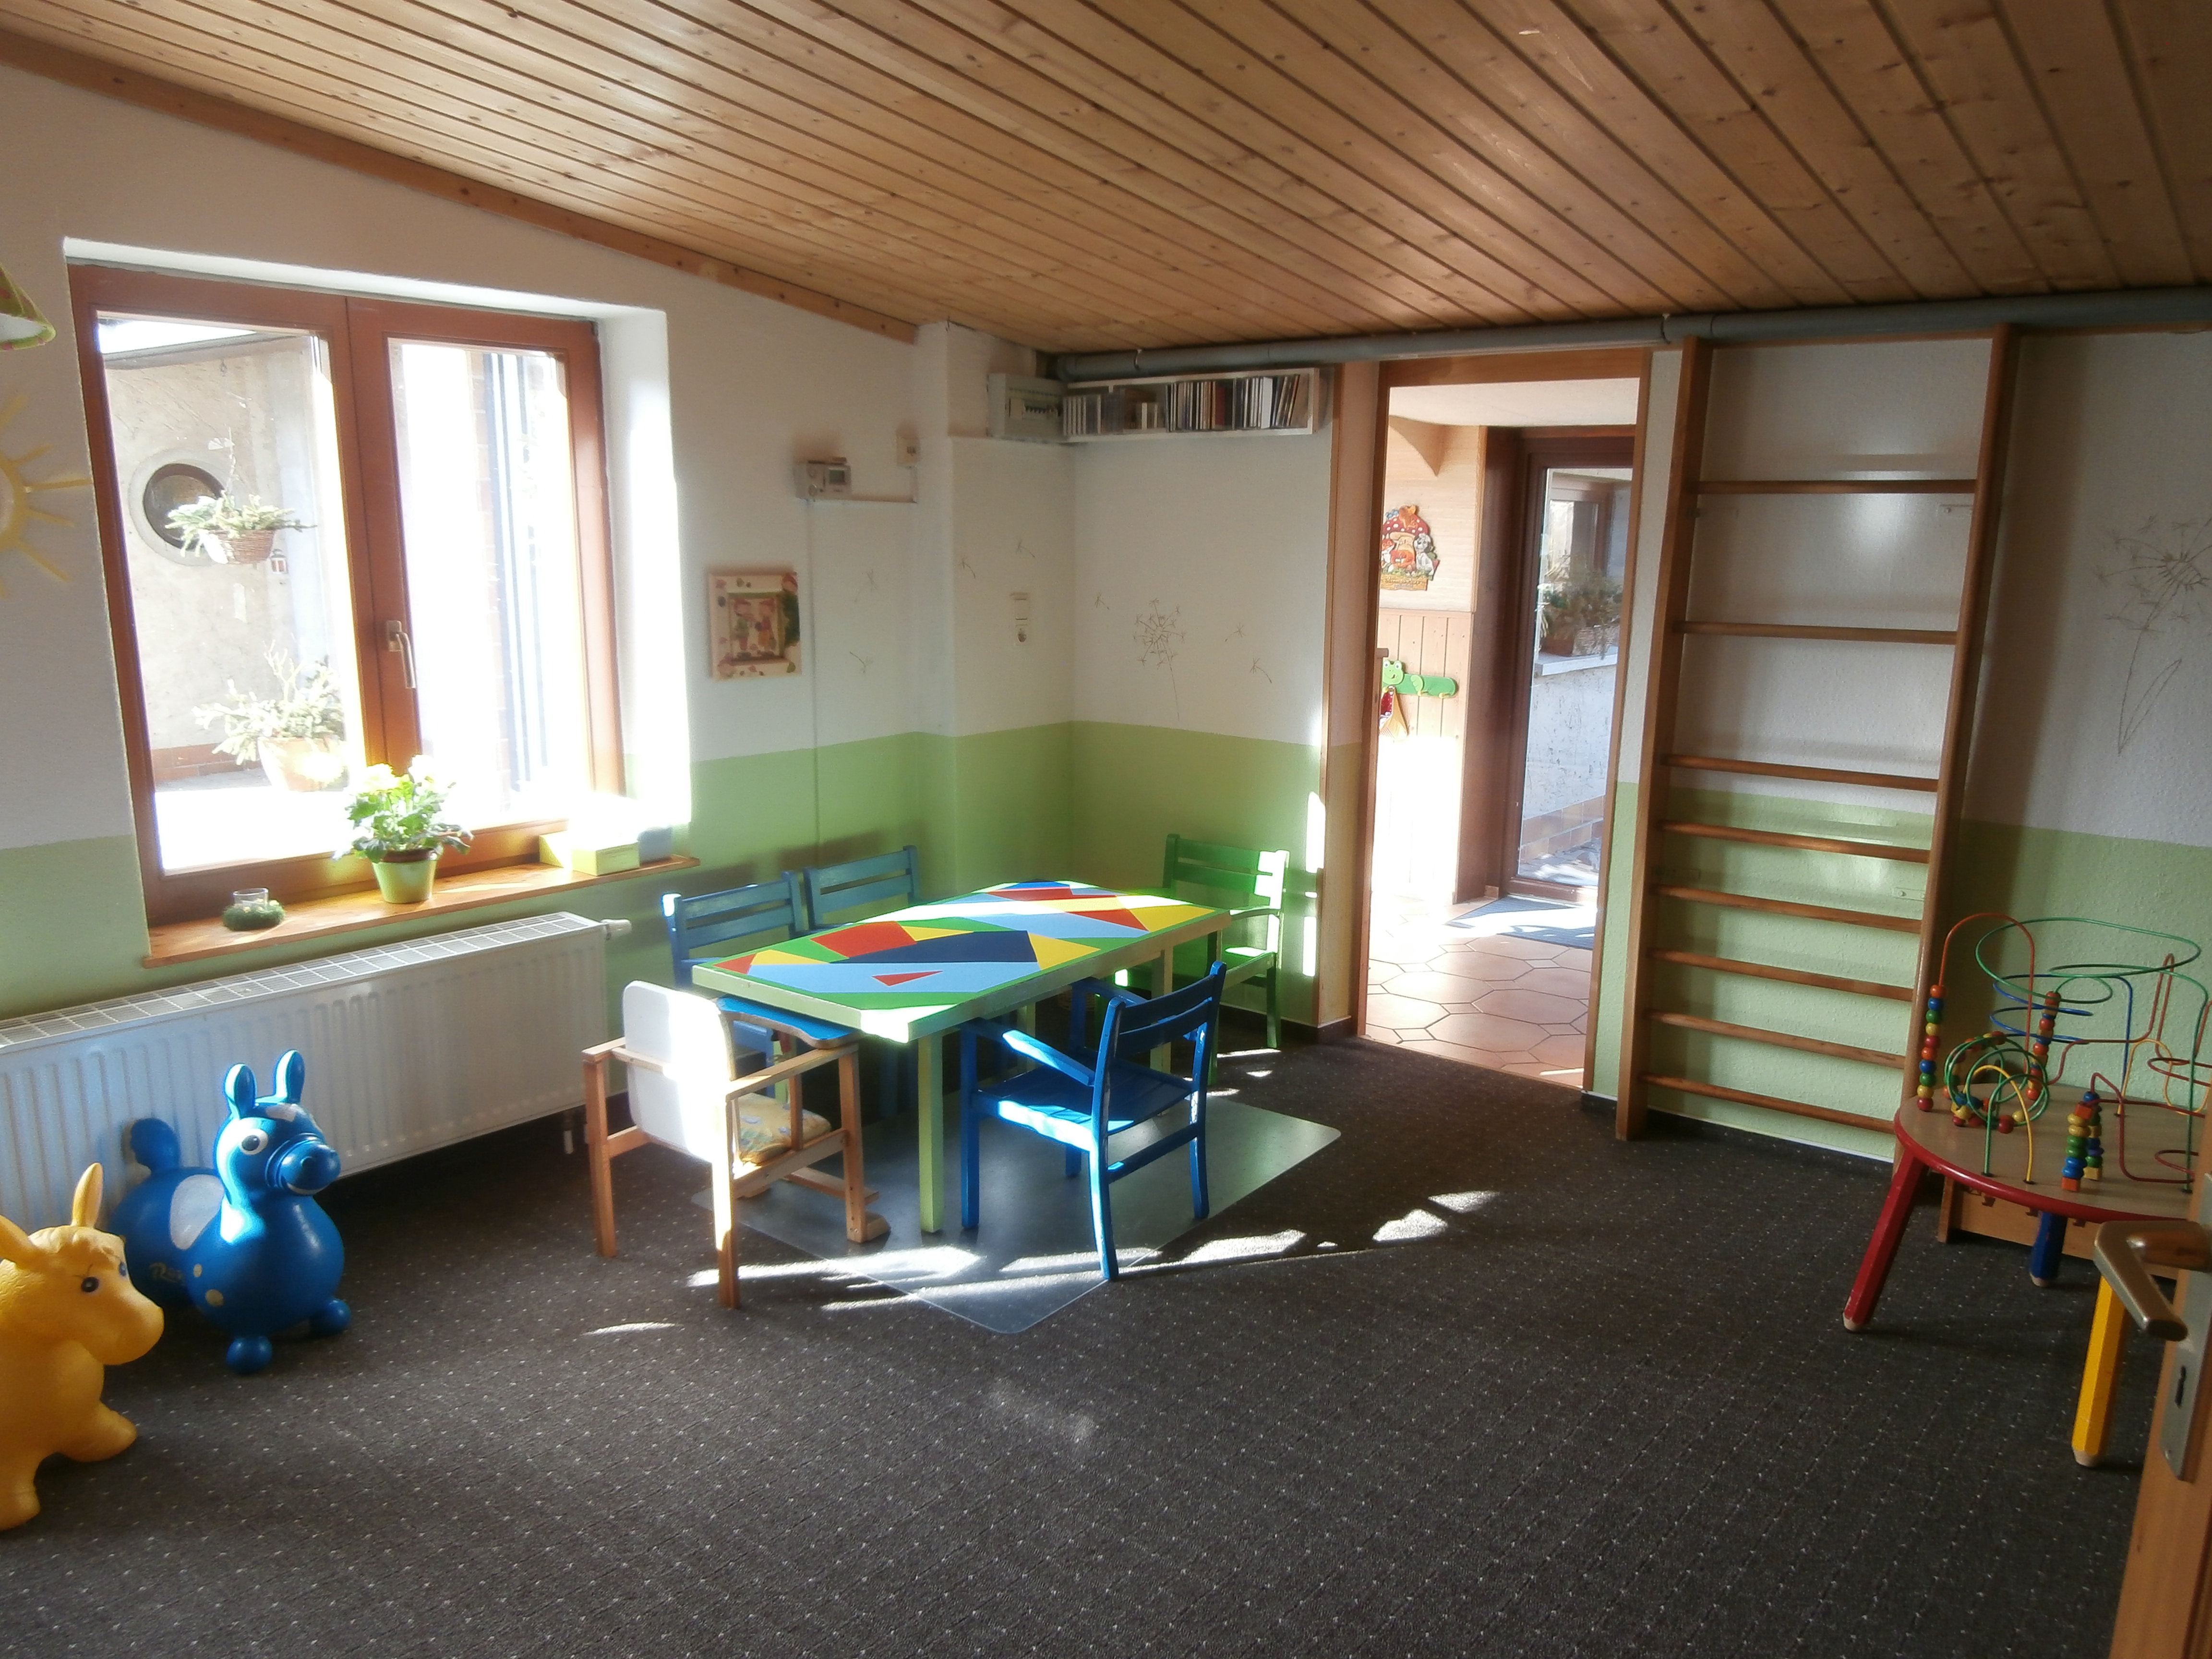 Farben: hellgrün, dunkelblau, Holzdecke, grauer Teppichboden